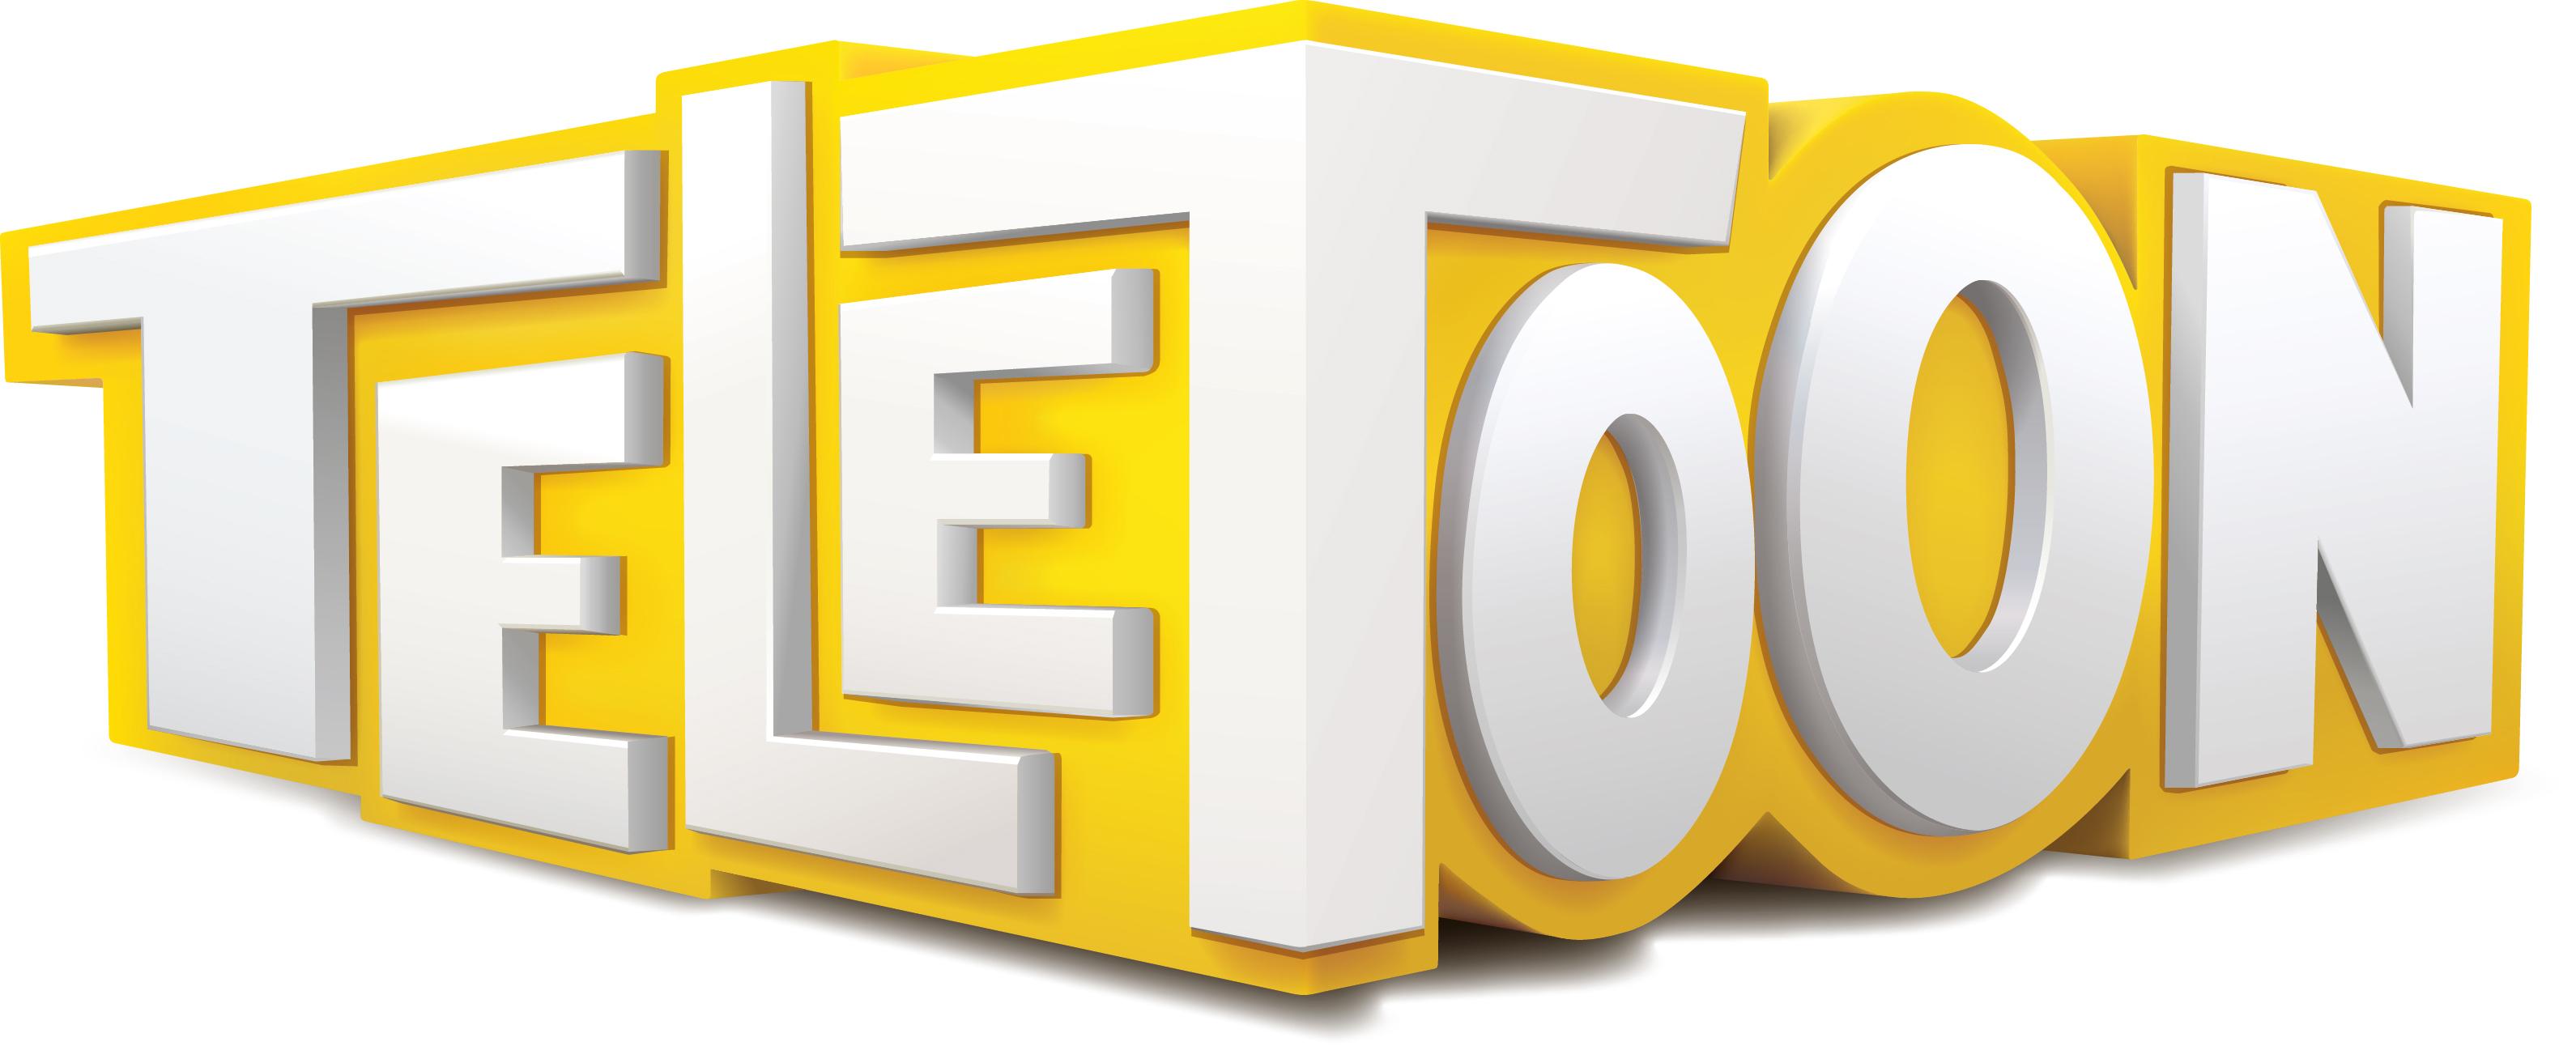 TELETOON logo